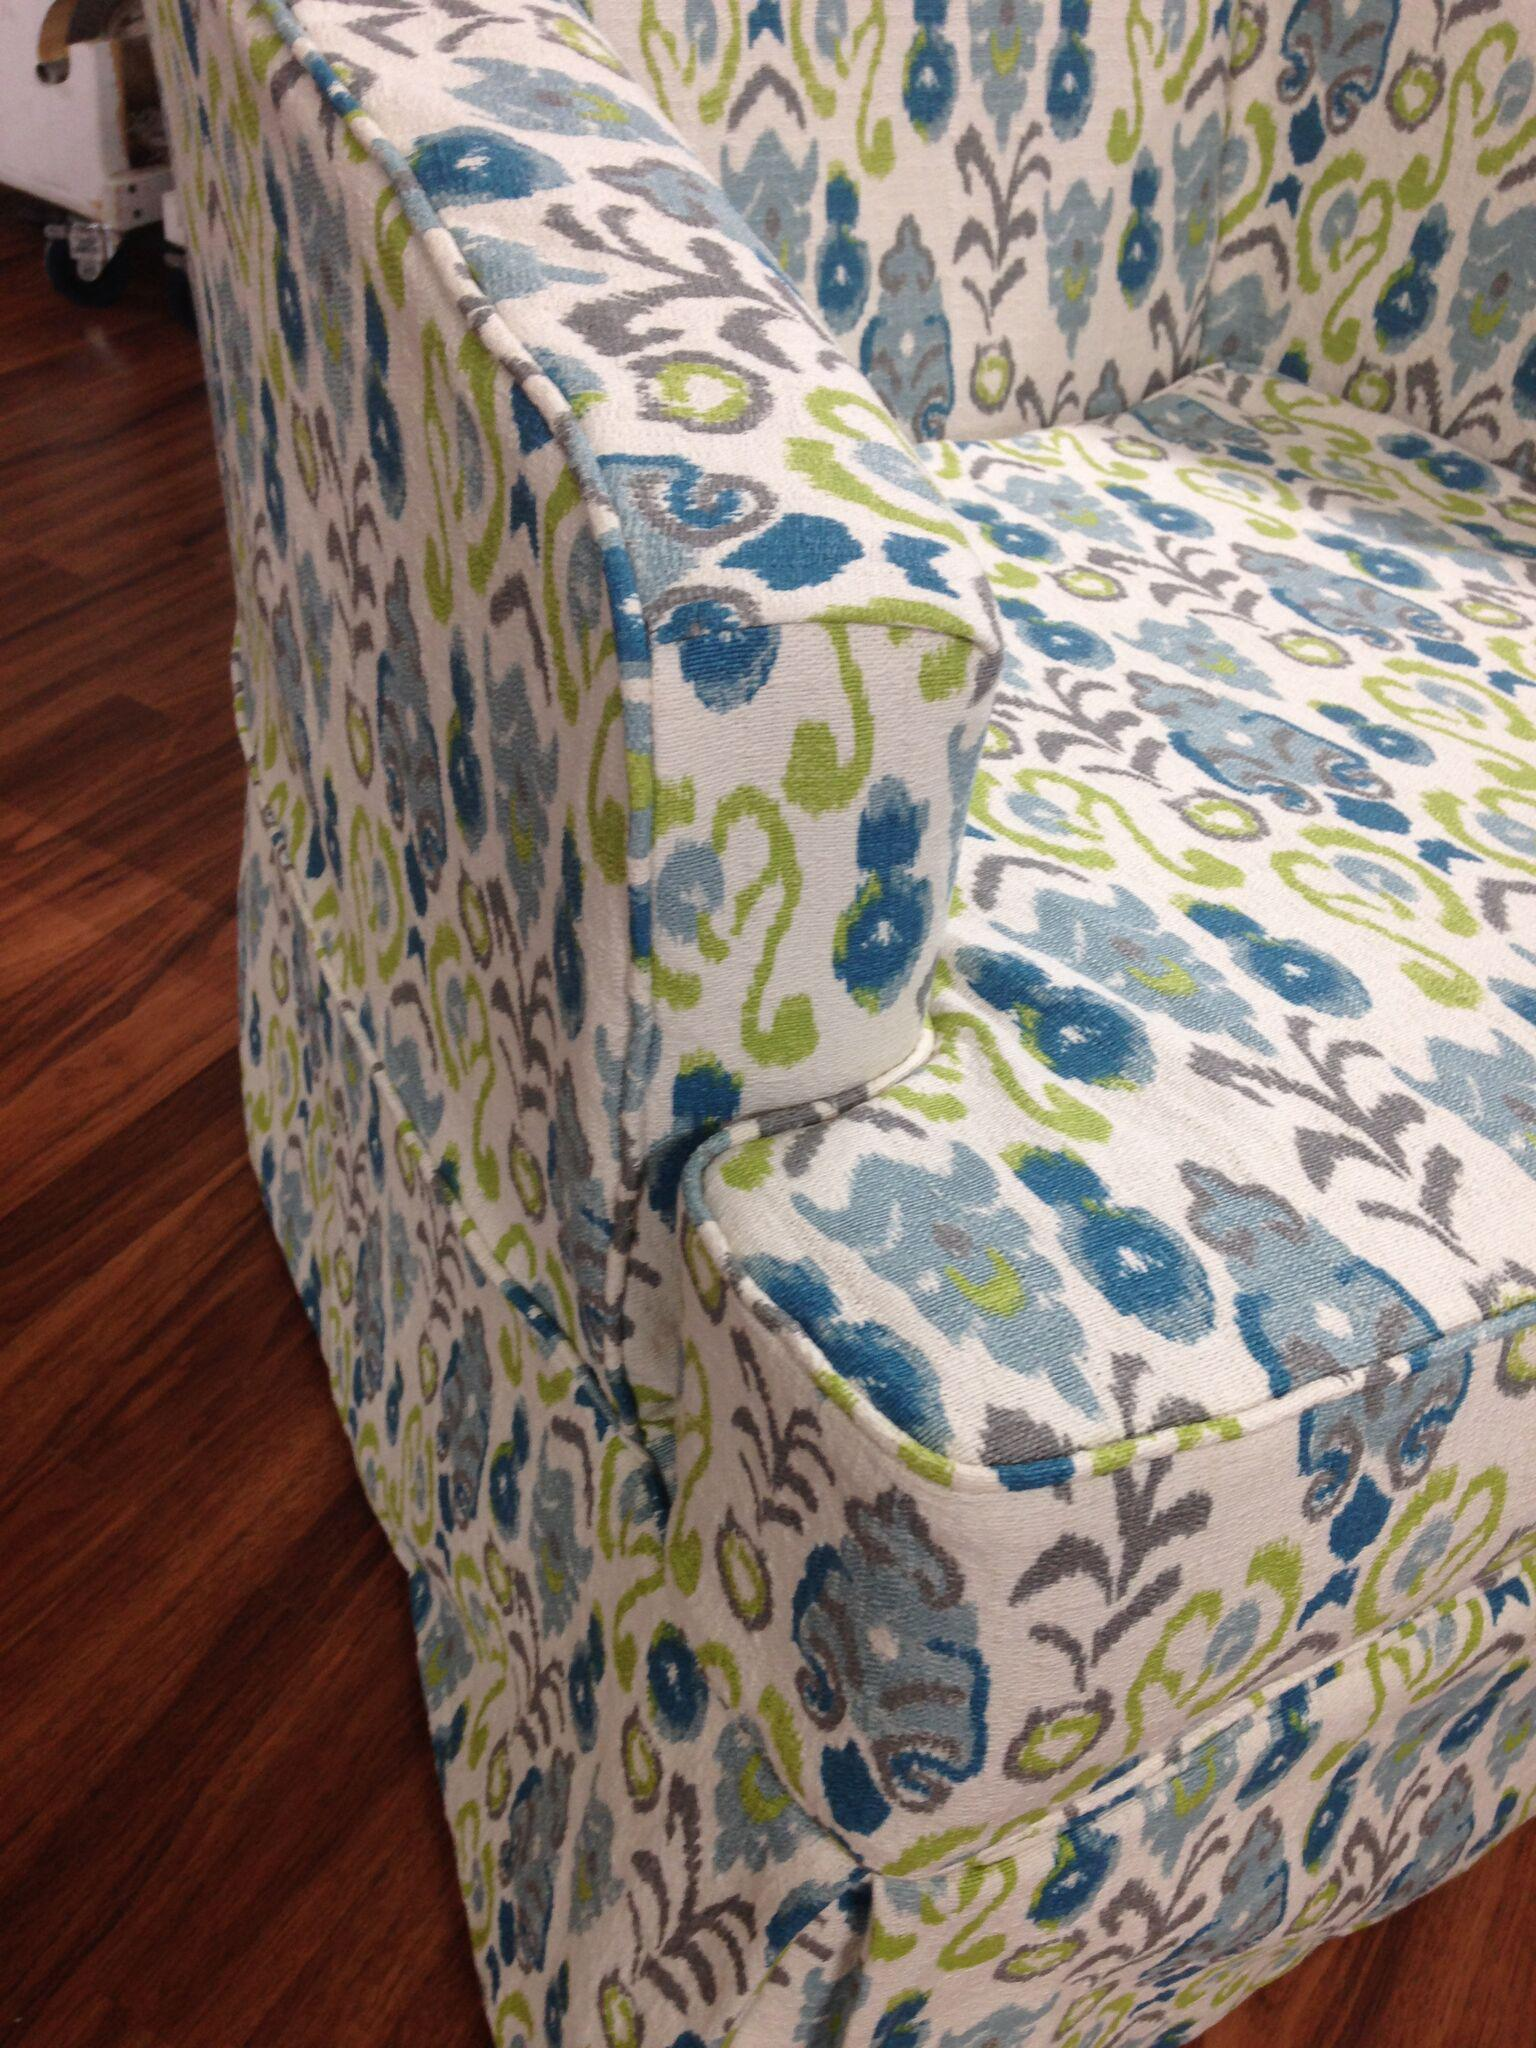 Fabric 8 Slipcovers image 38